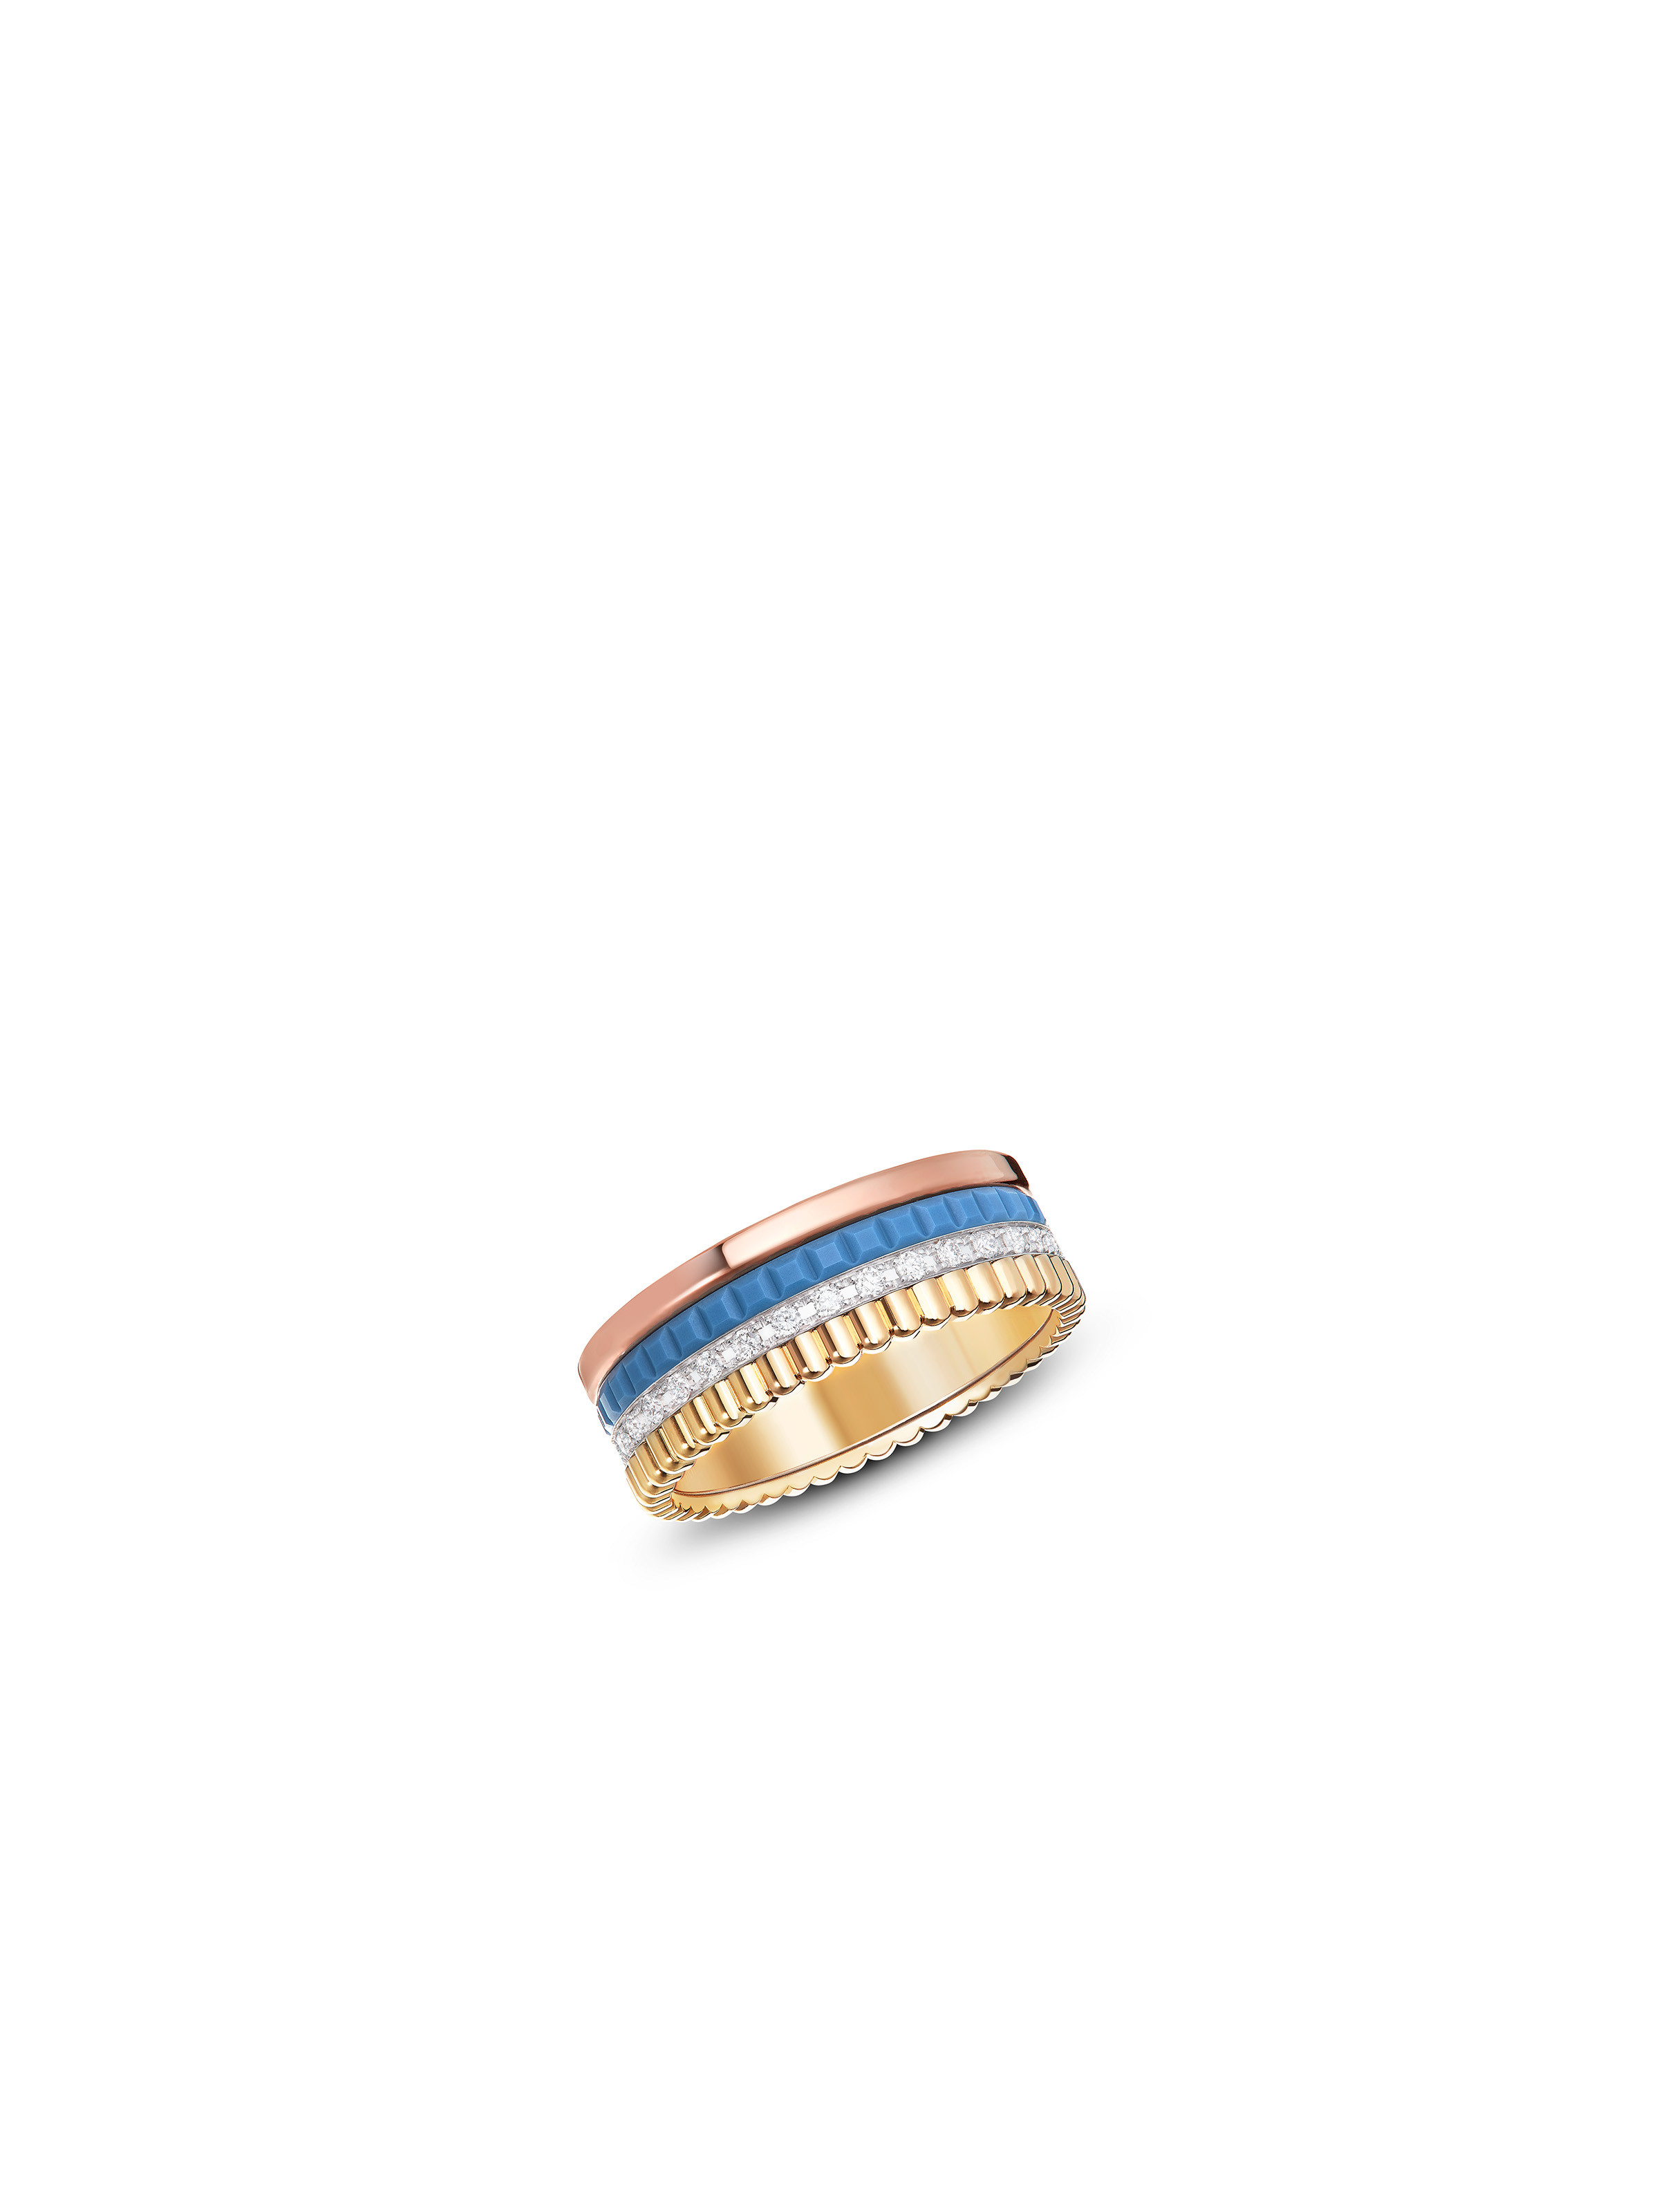 Quatre Blue Edition ring